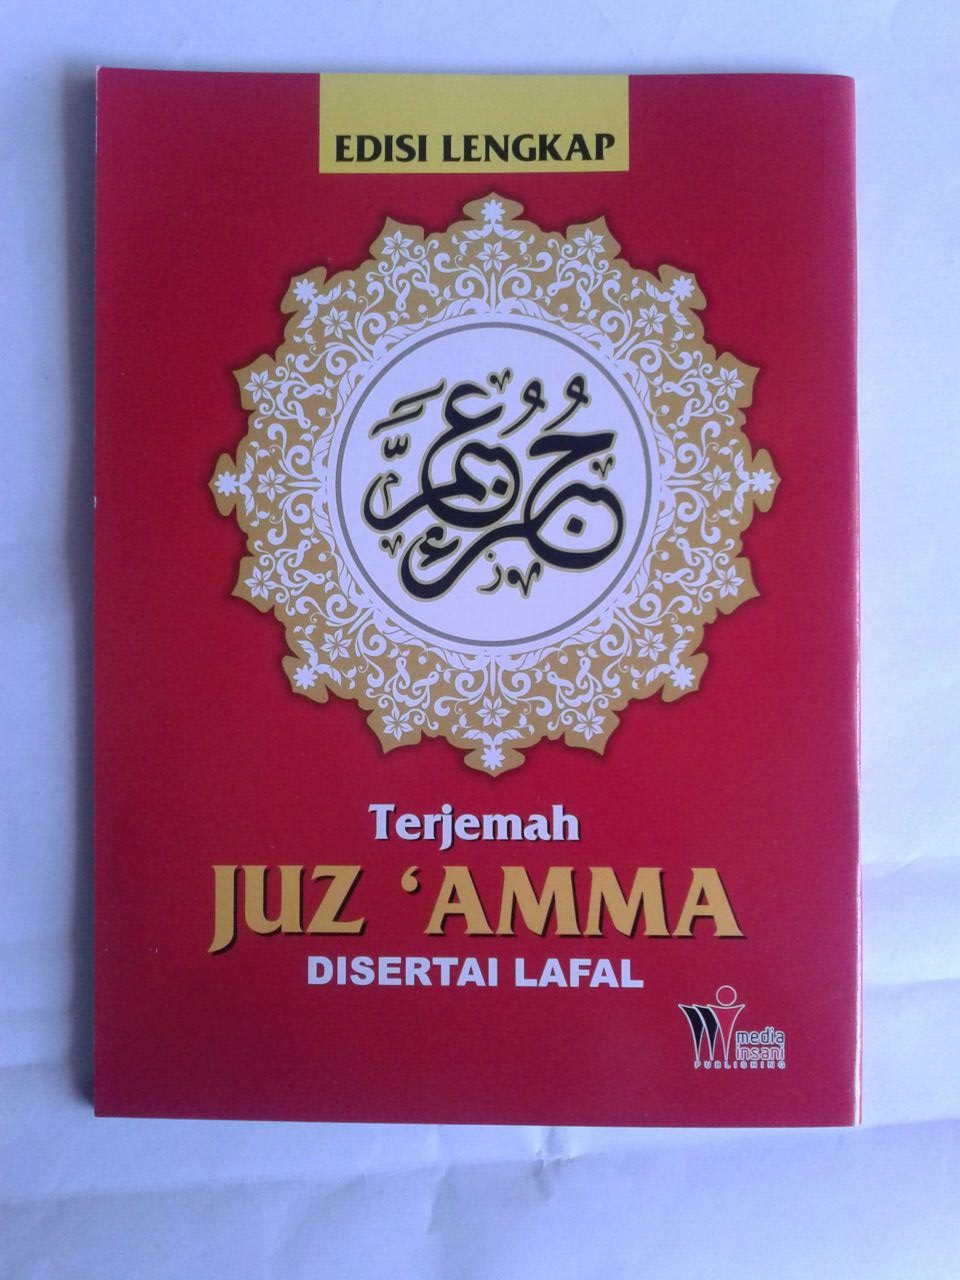 Buku Terjemah Juz Amma Disertai Lafal Transliterasi Ukuran A5 cover